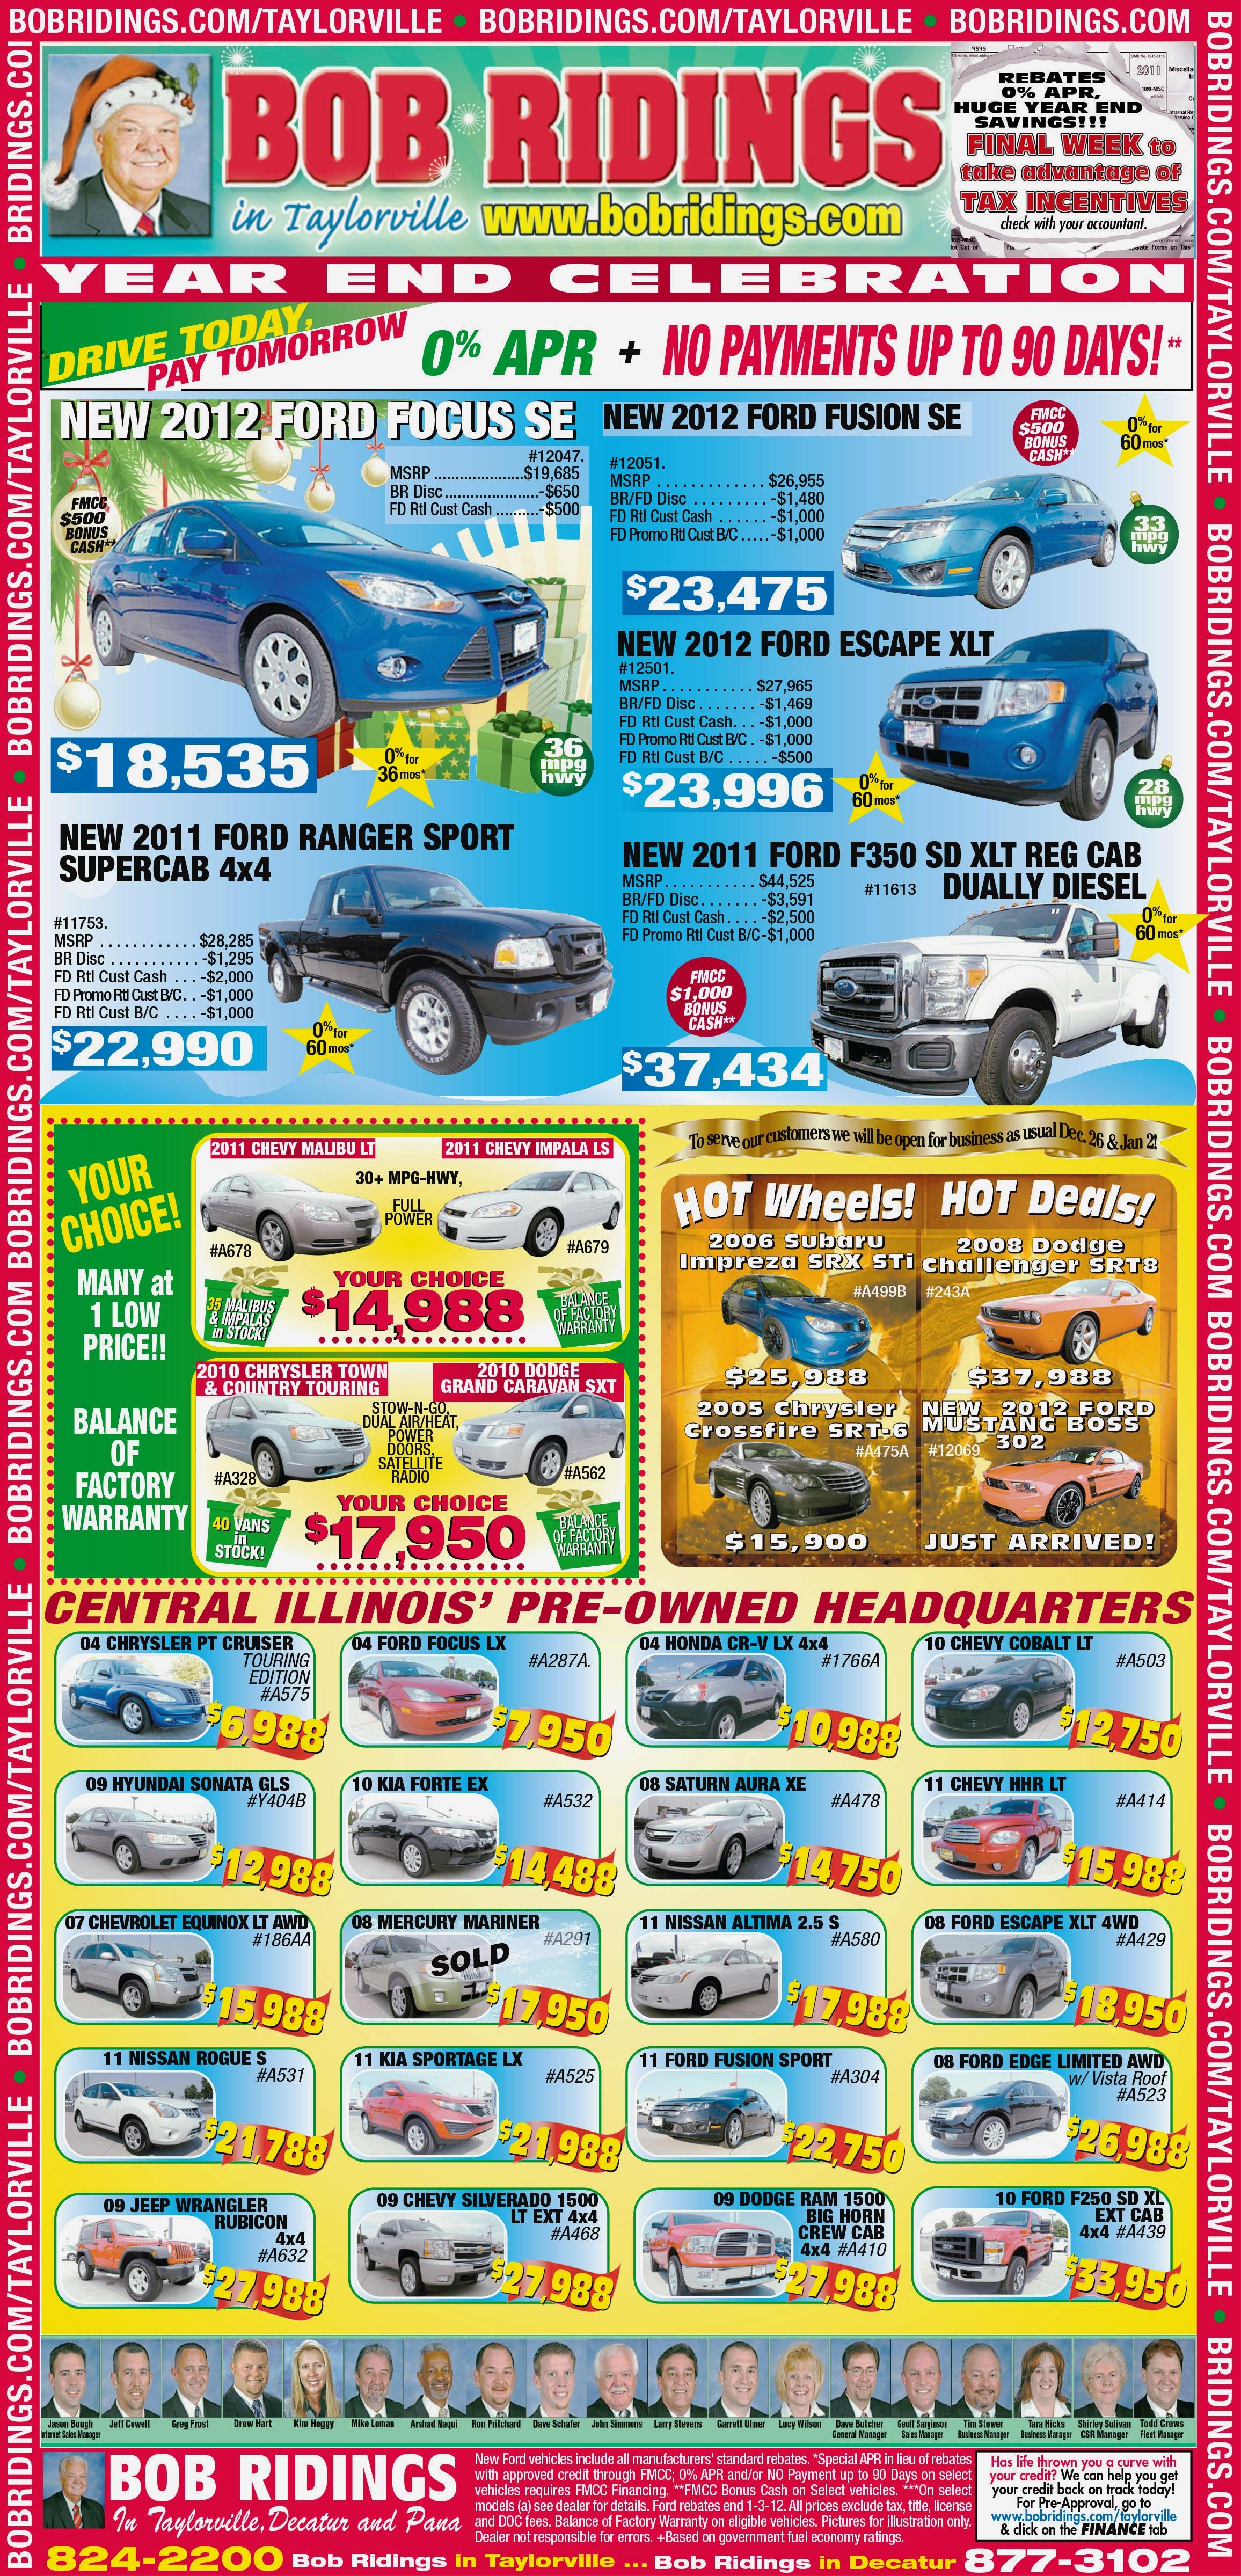 Bob Ridings Full Page Newspaper Ad